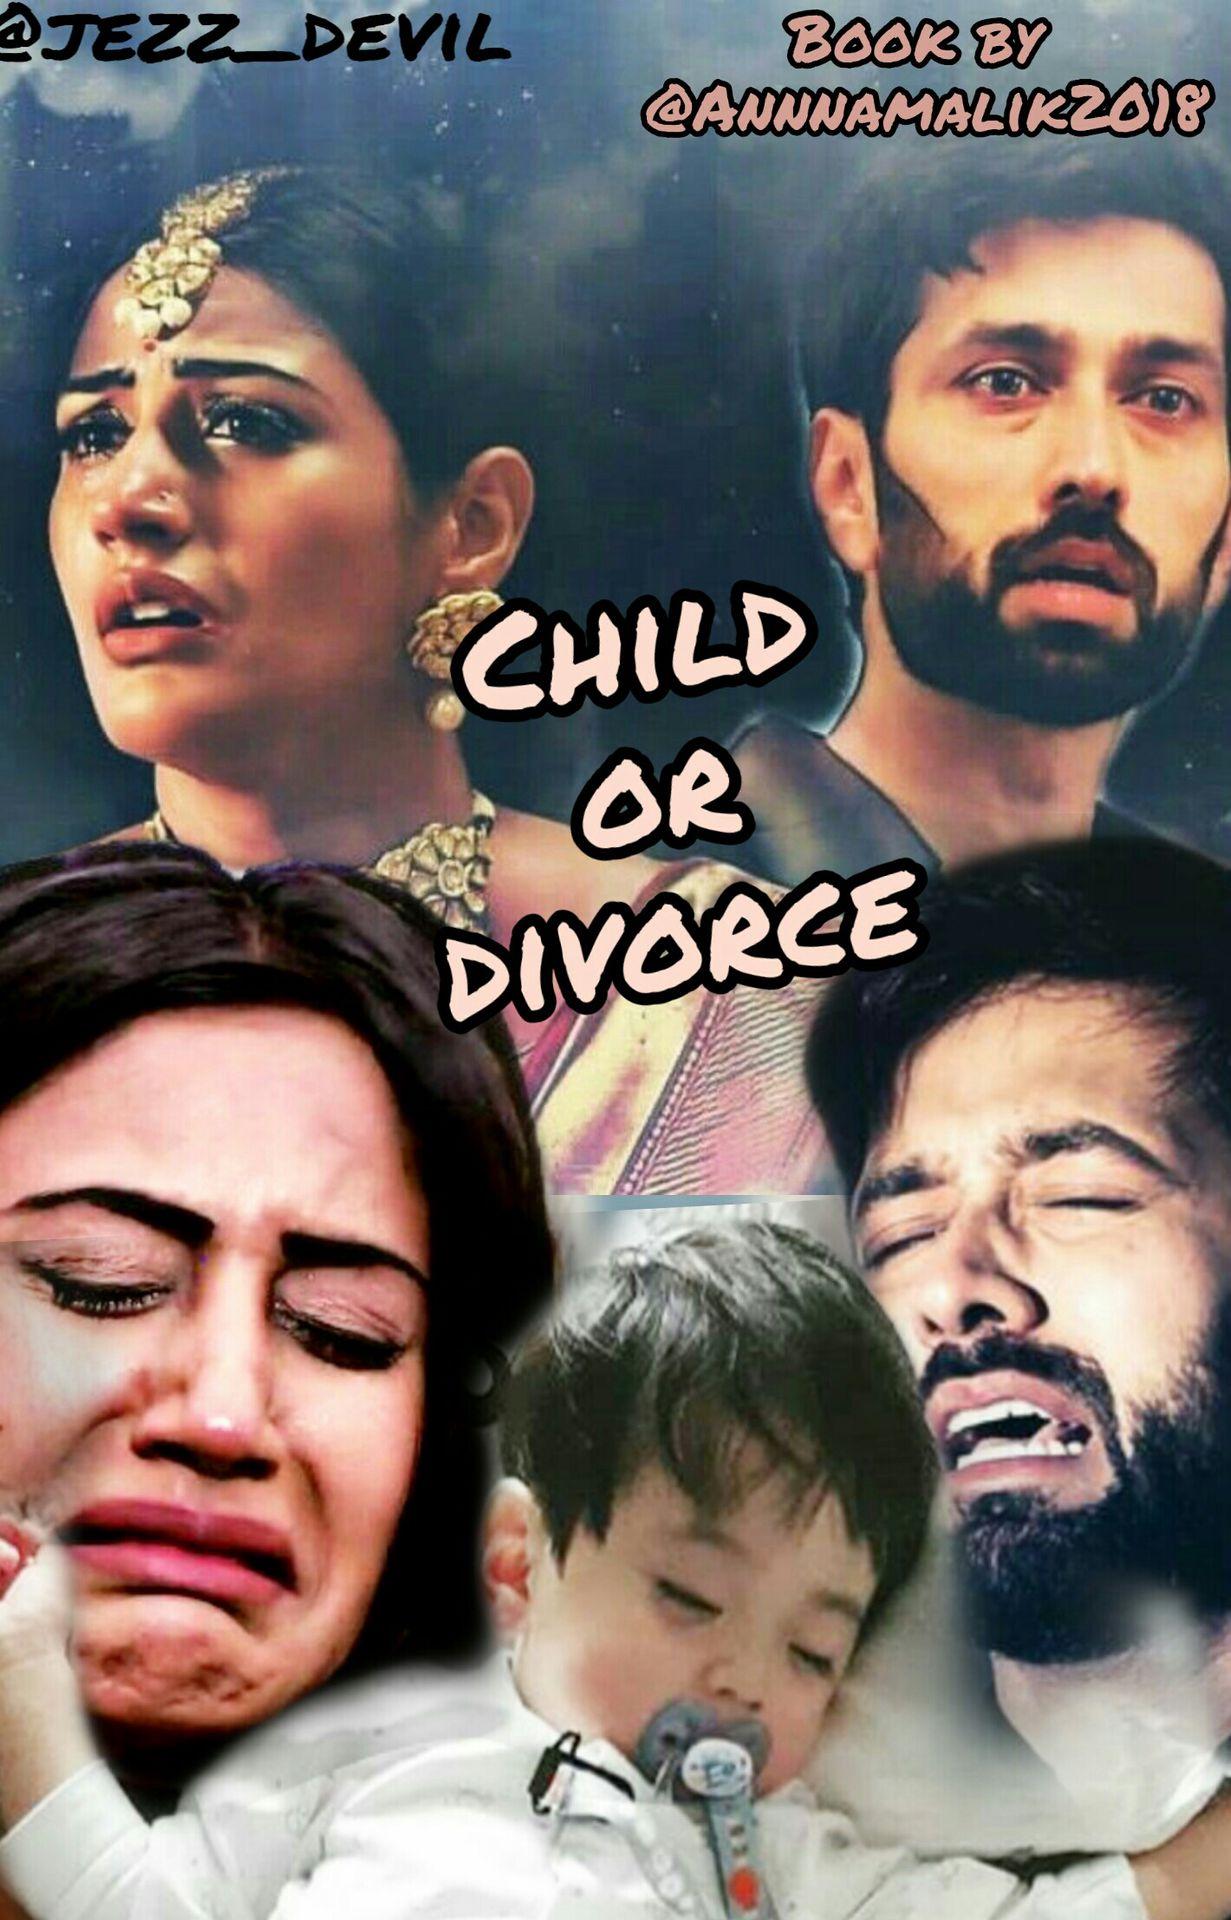 child or divorce - shot-9 - Page 2 - Wattpad